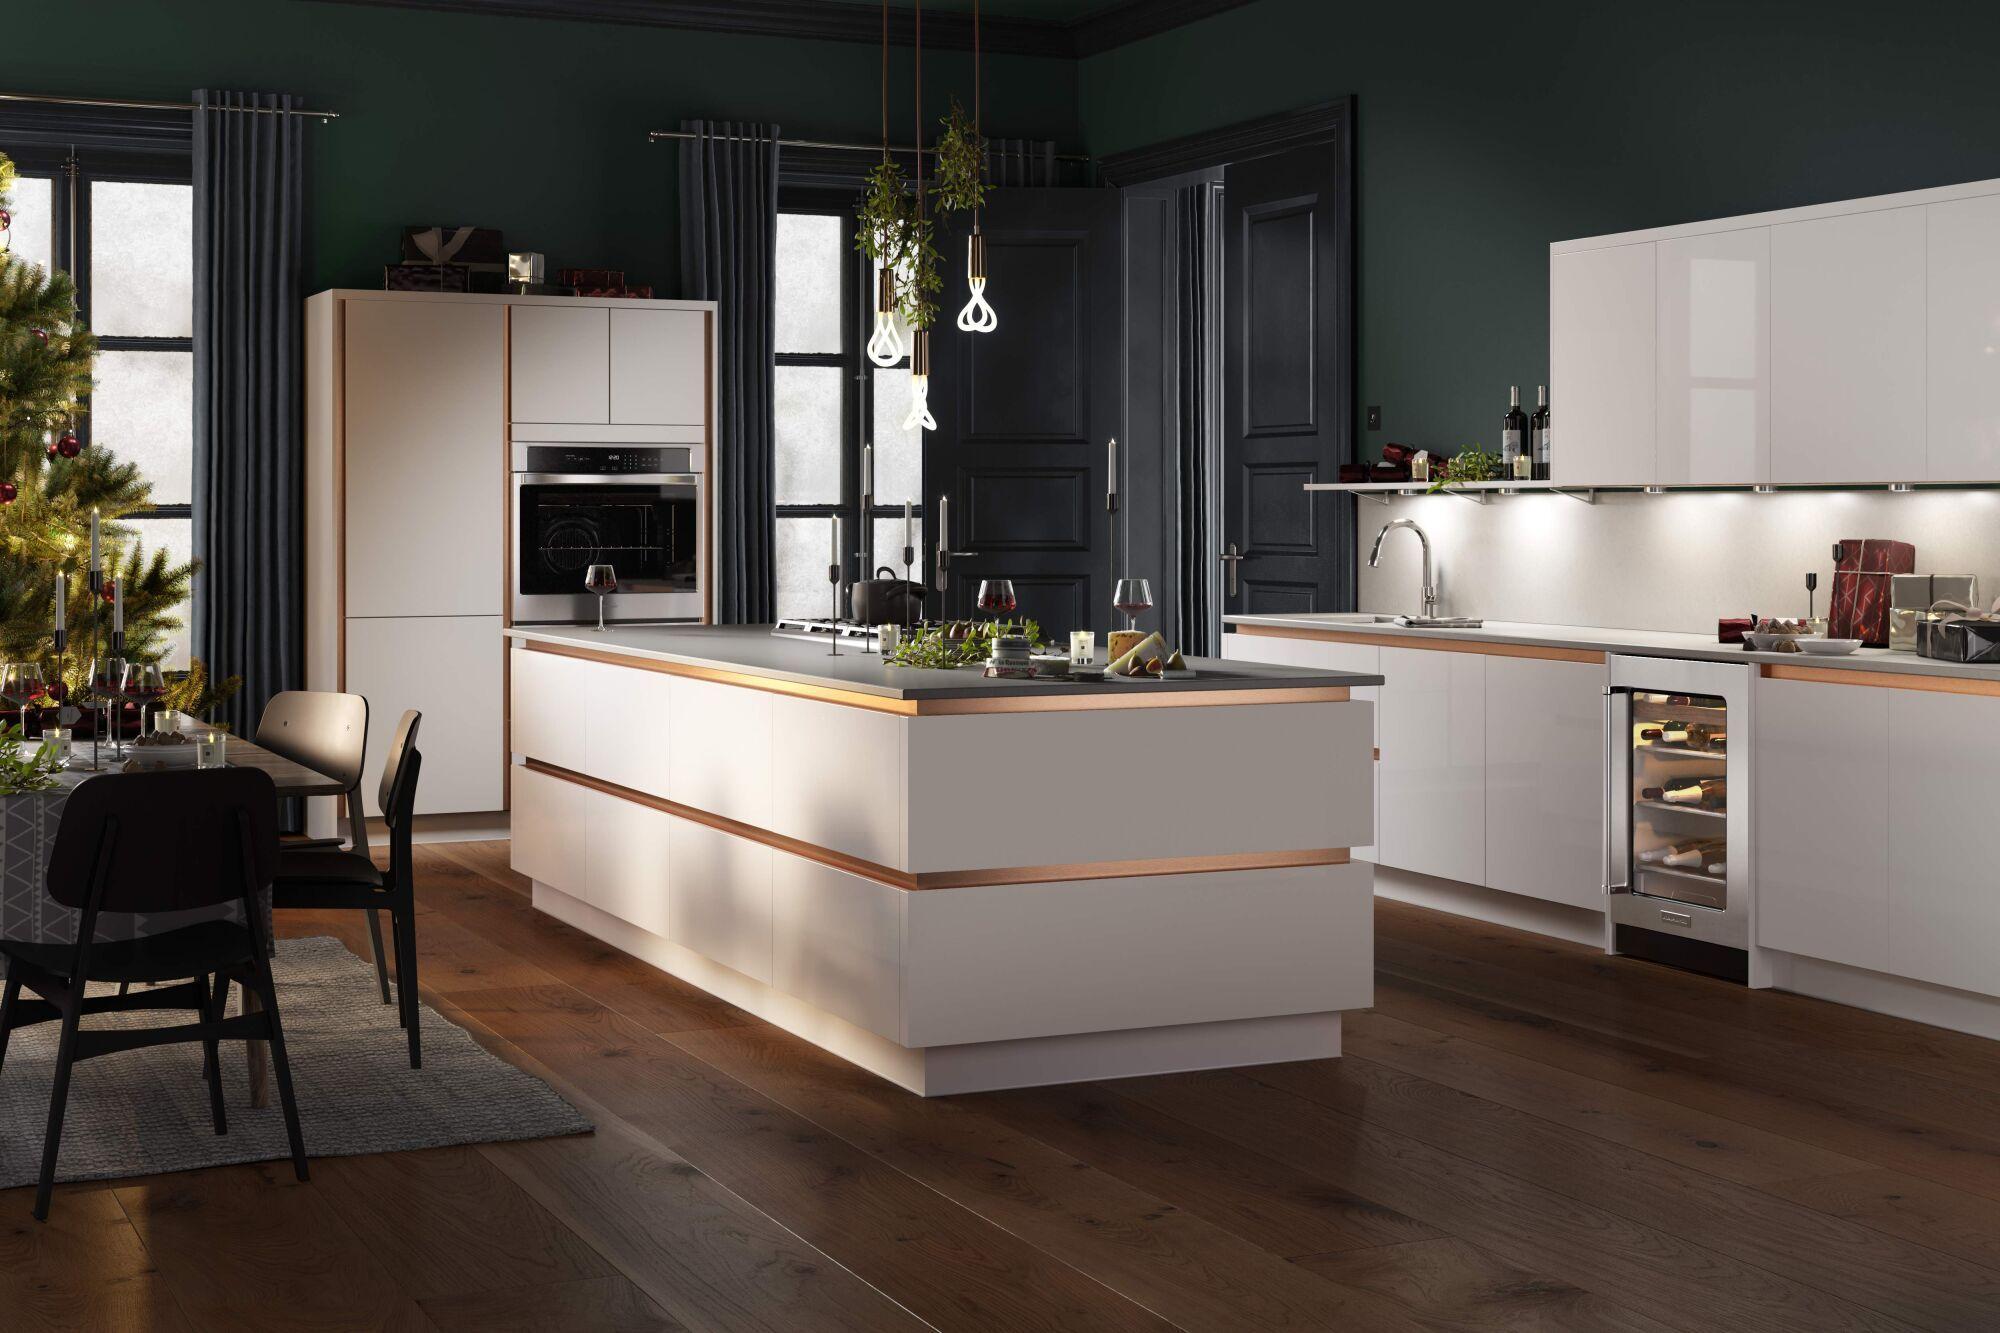 Milano Ultra Kitchen in Bianco